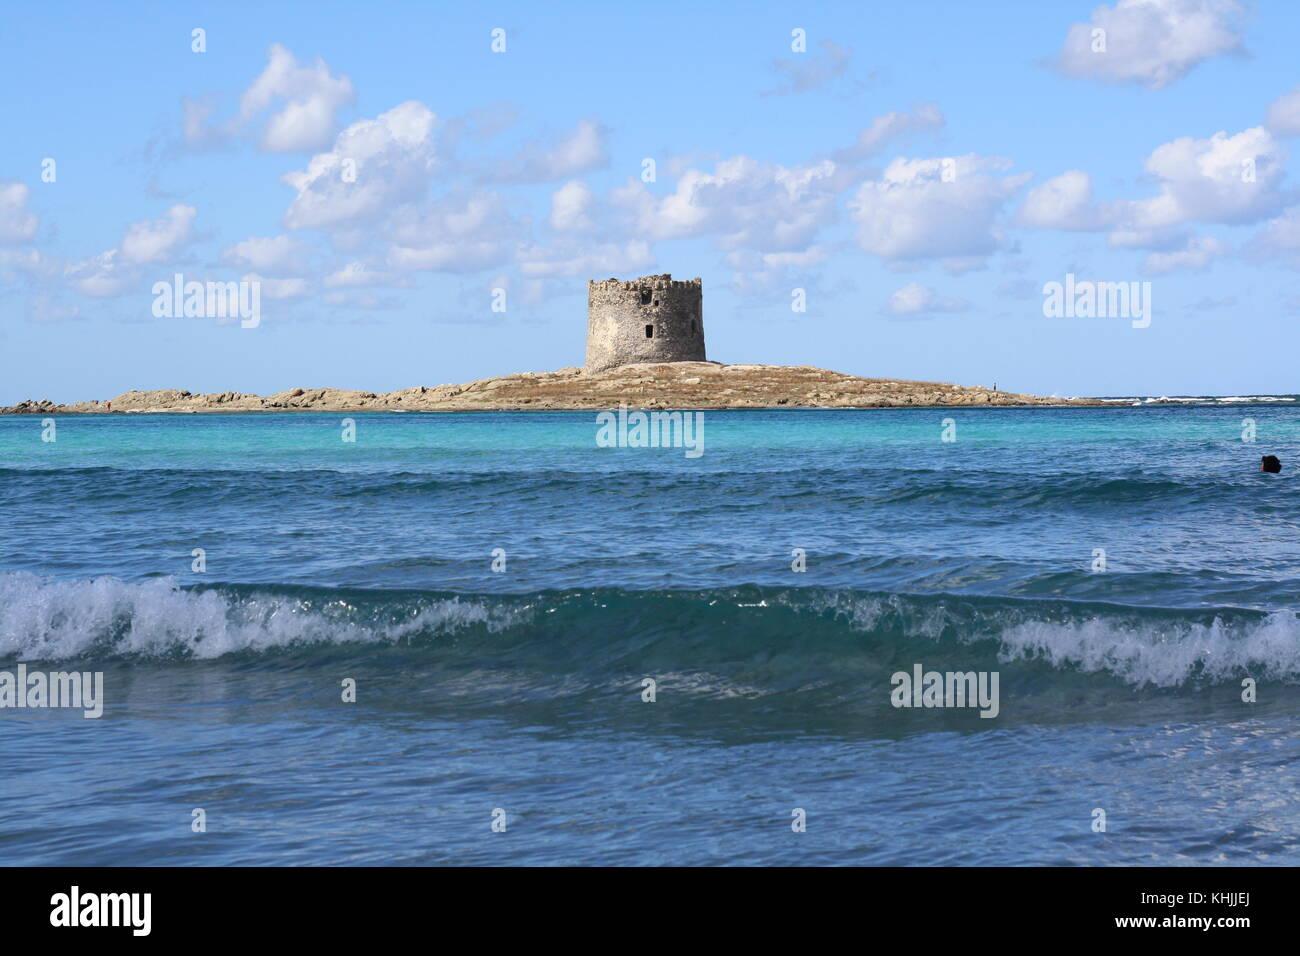 A stone tower called nuraghe on La Pelosa beach in Sardinia. - Stock Image